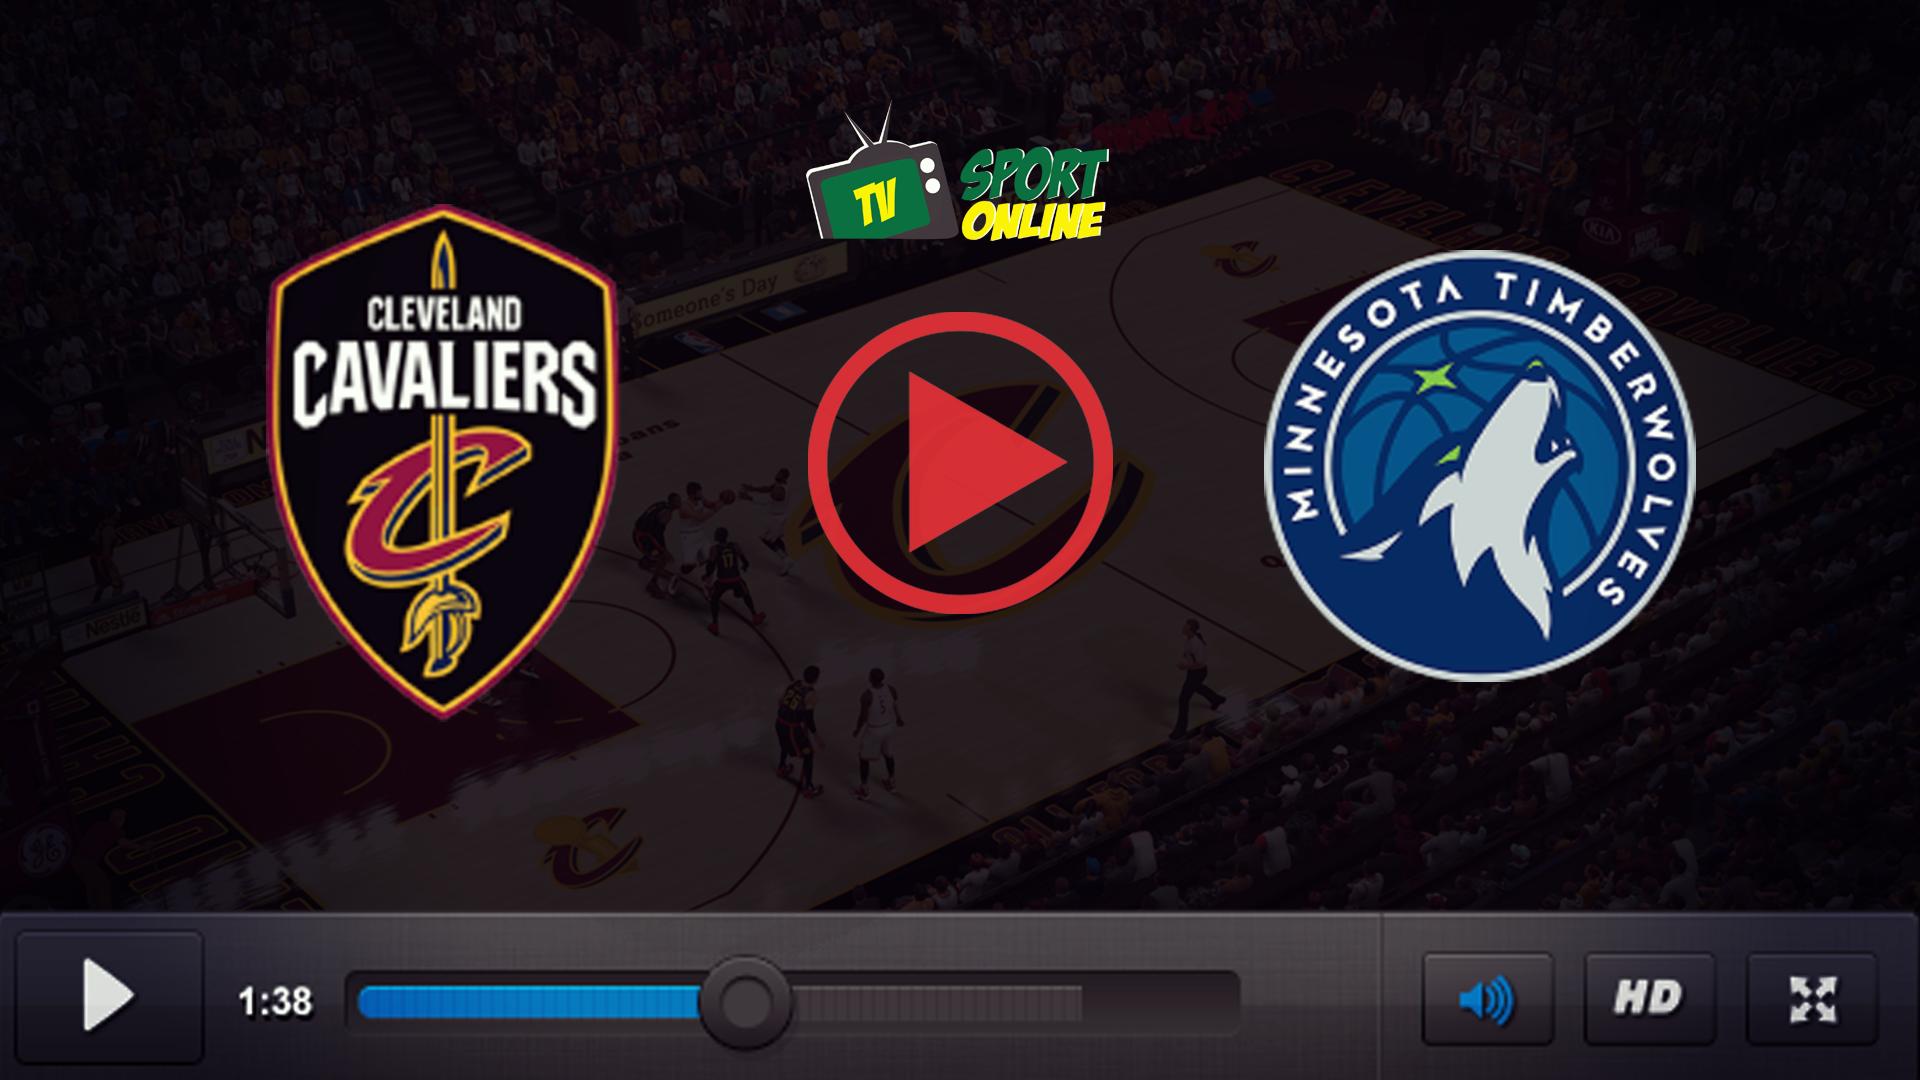 Watch Live Stream Cleveland Cavaliers – Minnesota Timberwolves